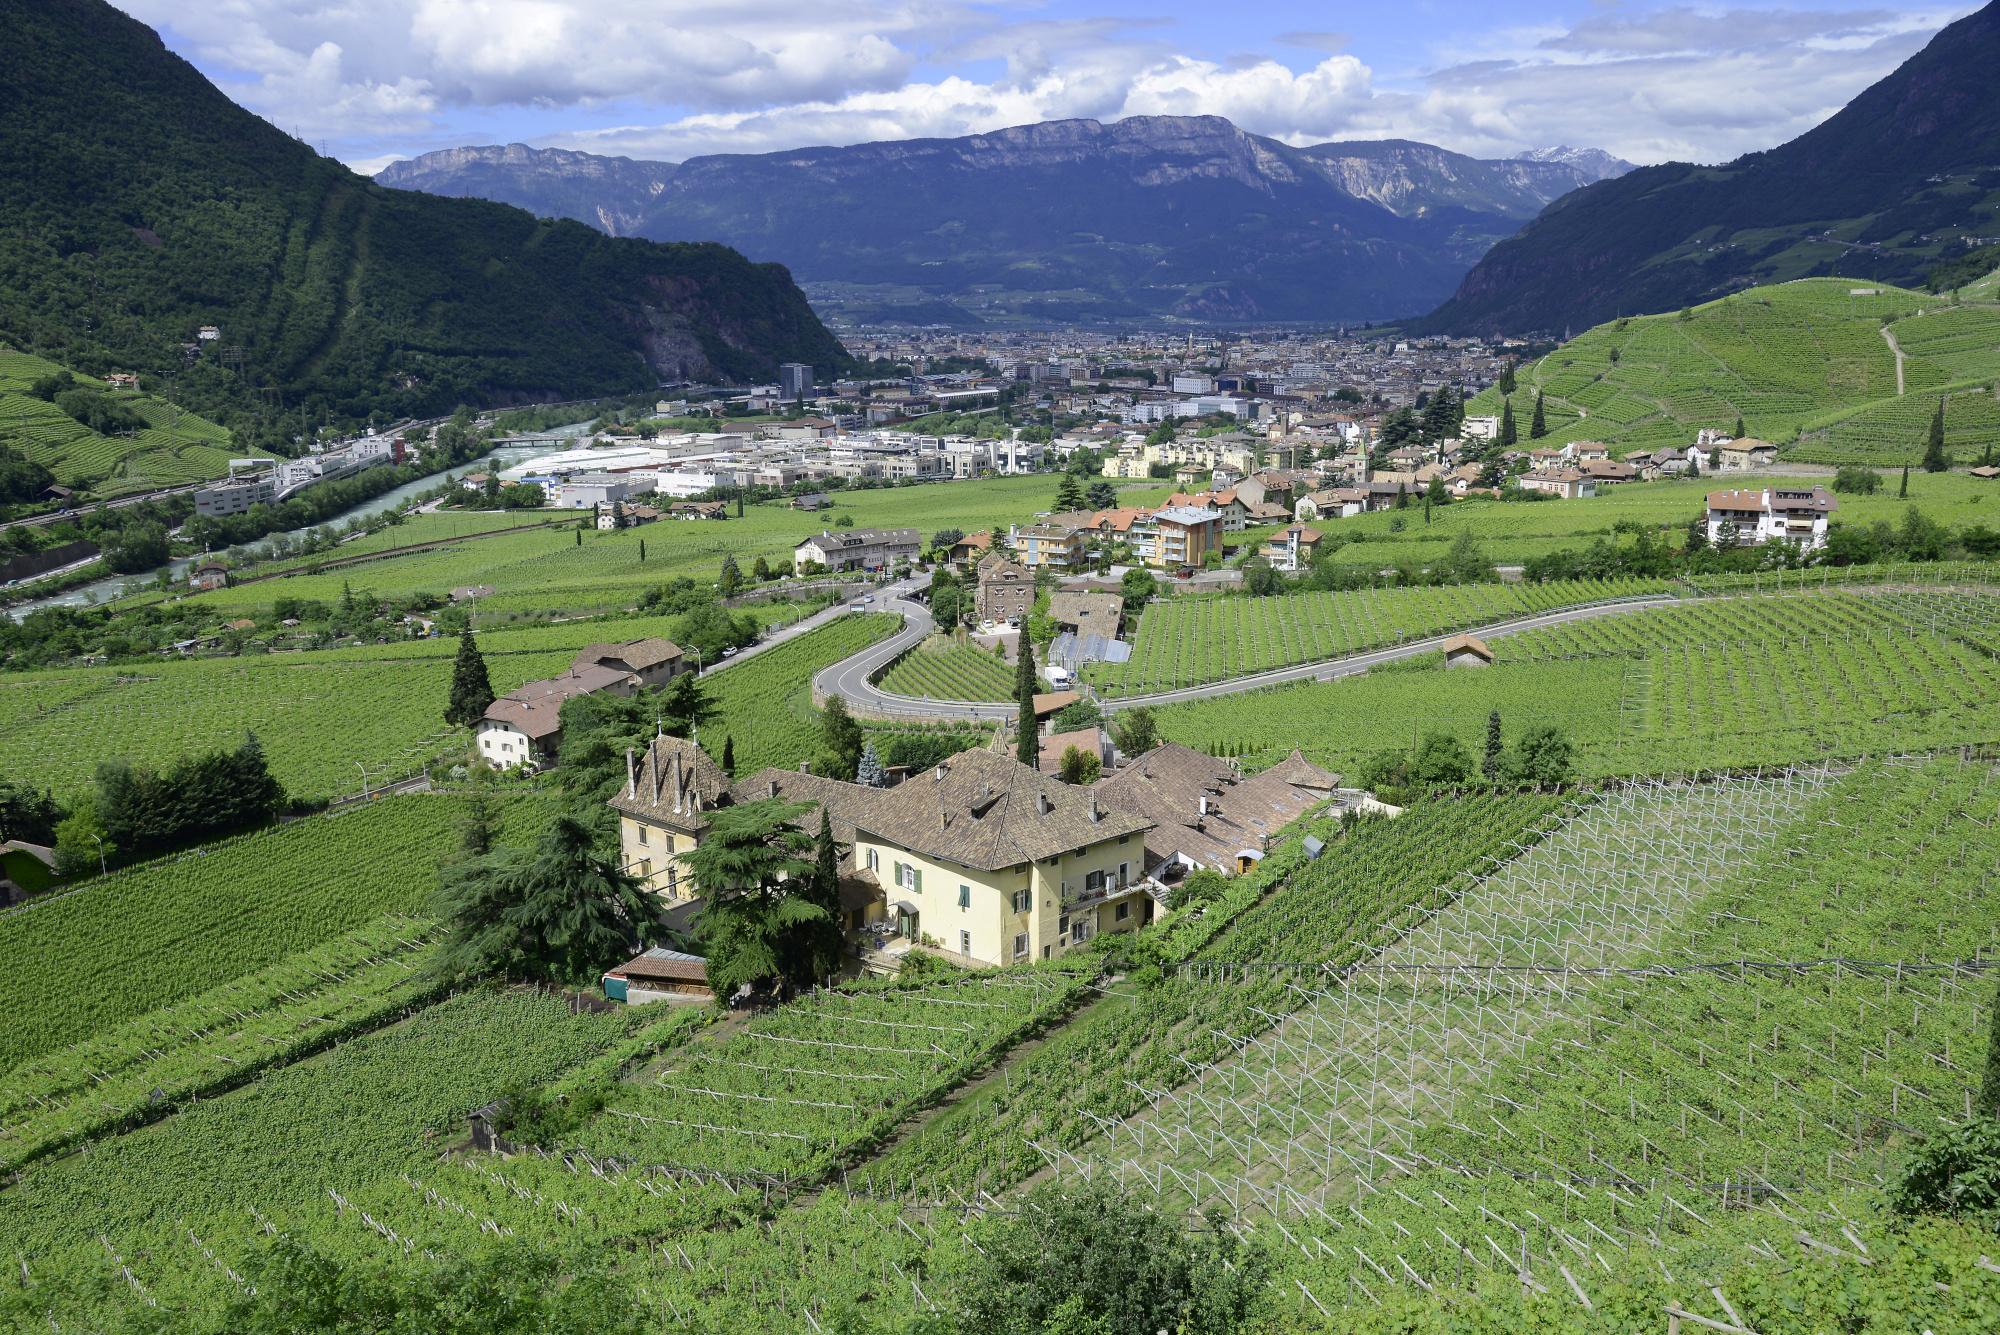 Bolzano 2 bolzano pictures geography im austria forum for Schuhschrank bozen 461 002